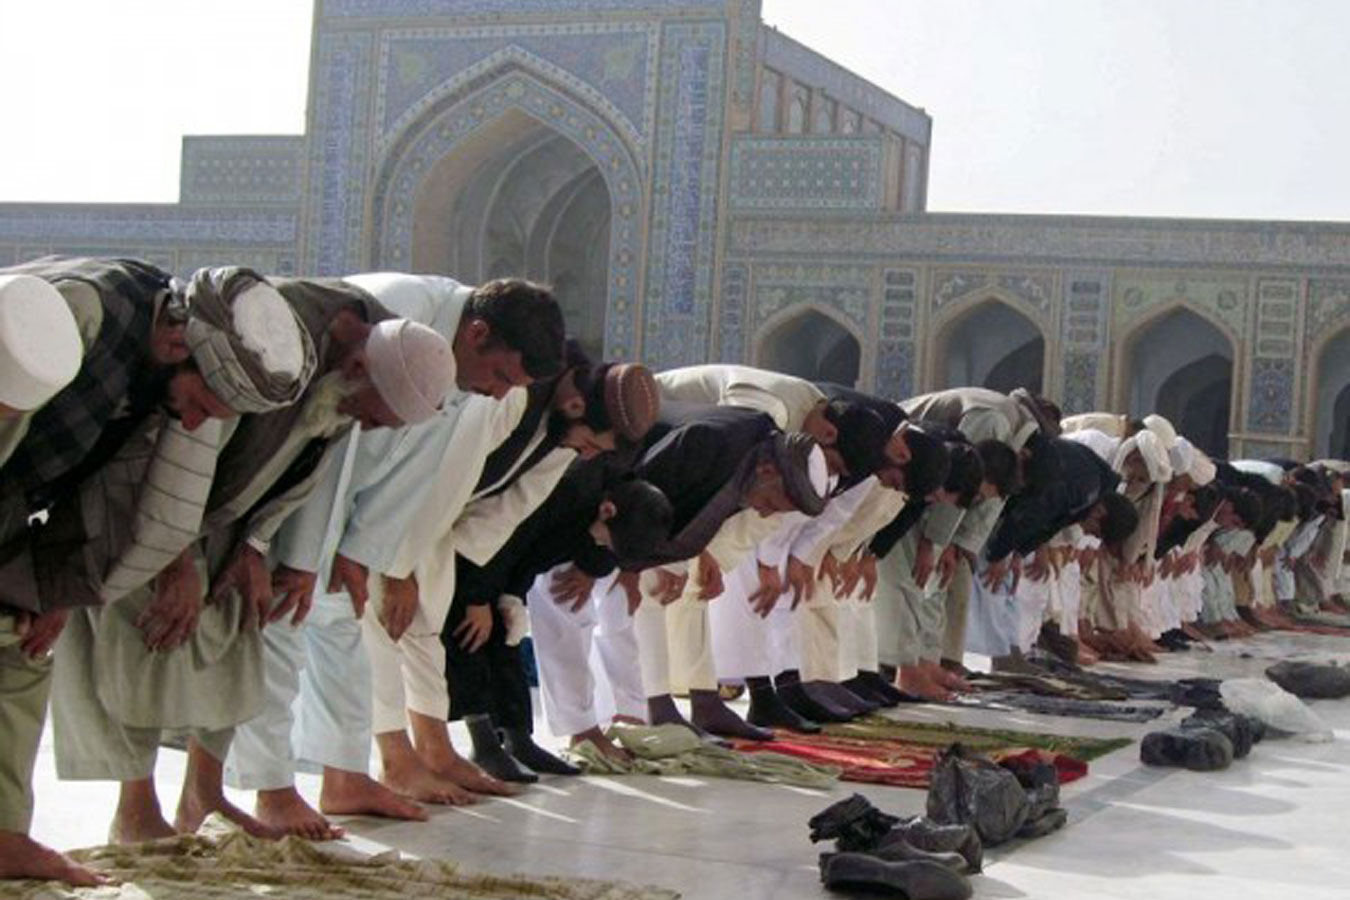 http://www.islam.ru/sites/default/files/img/veroeshenie/2011/11/namaz_dj_01_b.jpg